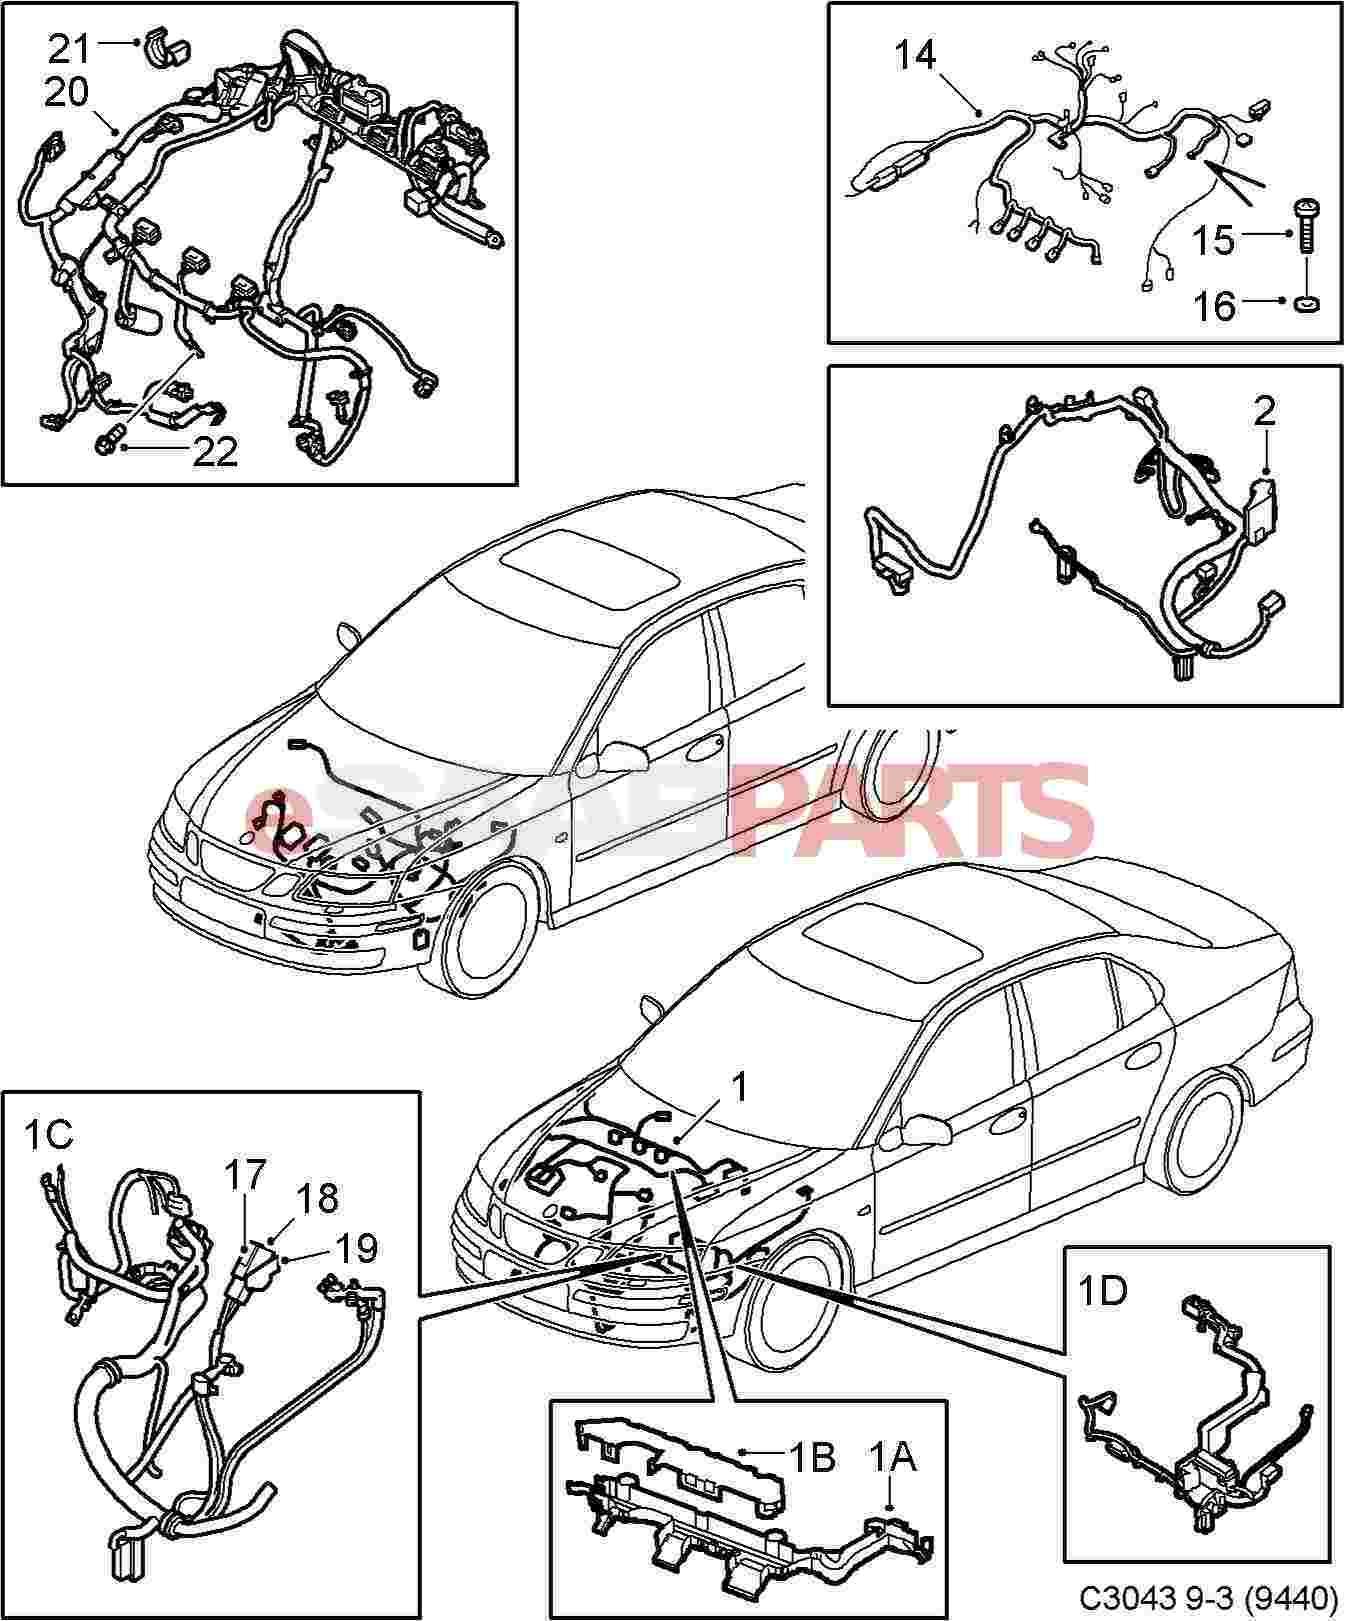 hight resolution of saab 9 3 2006 wiring harness wiring diagrams konsult esaabparts com saab 9 3 9440